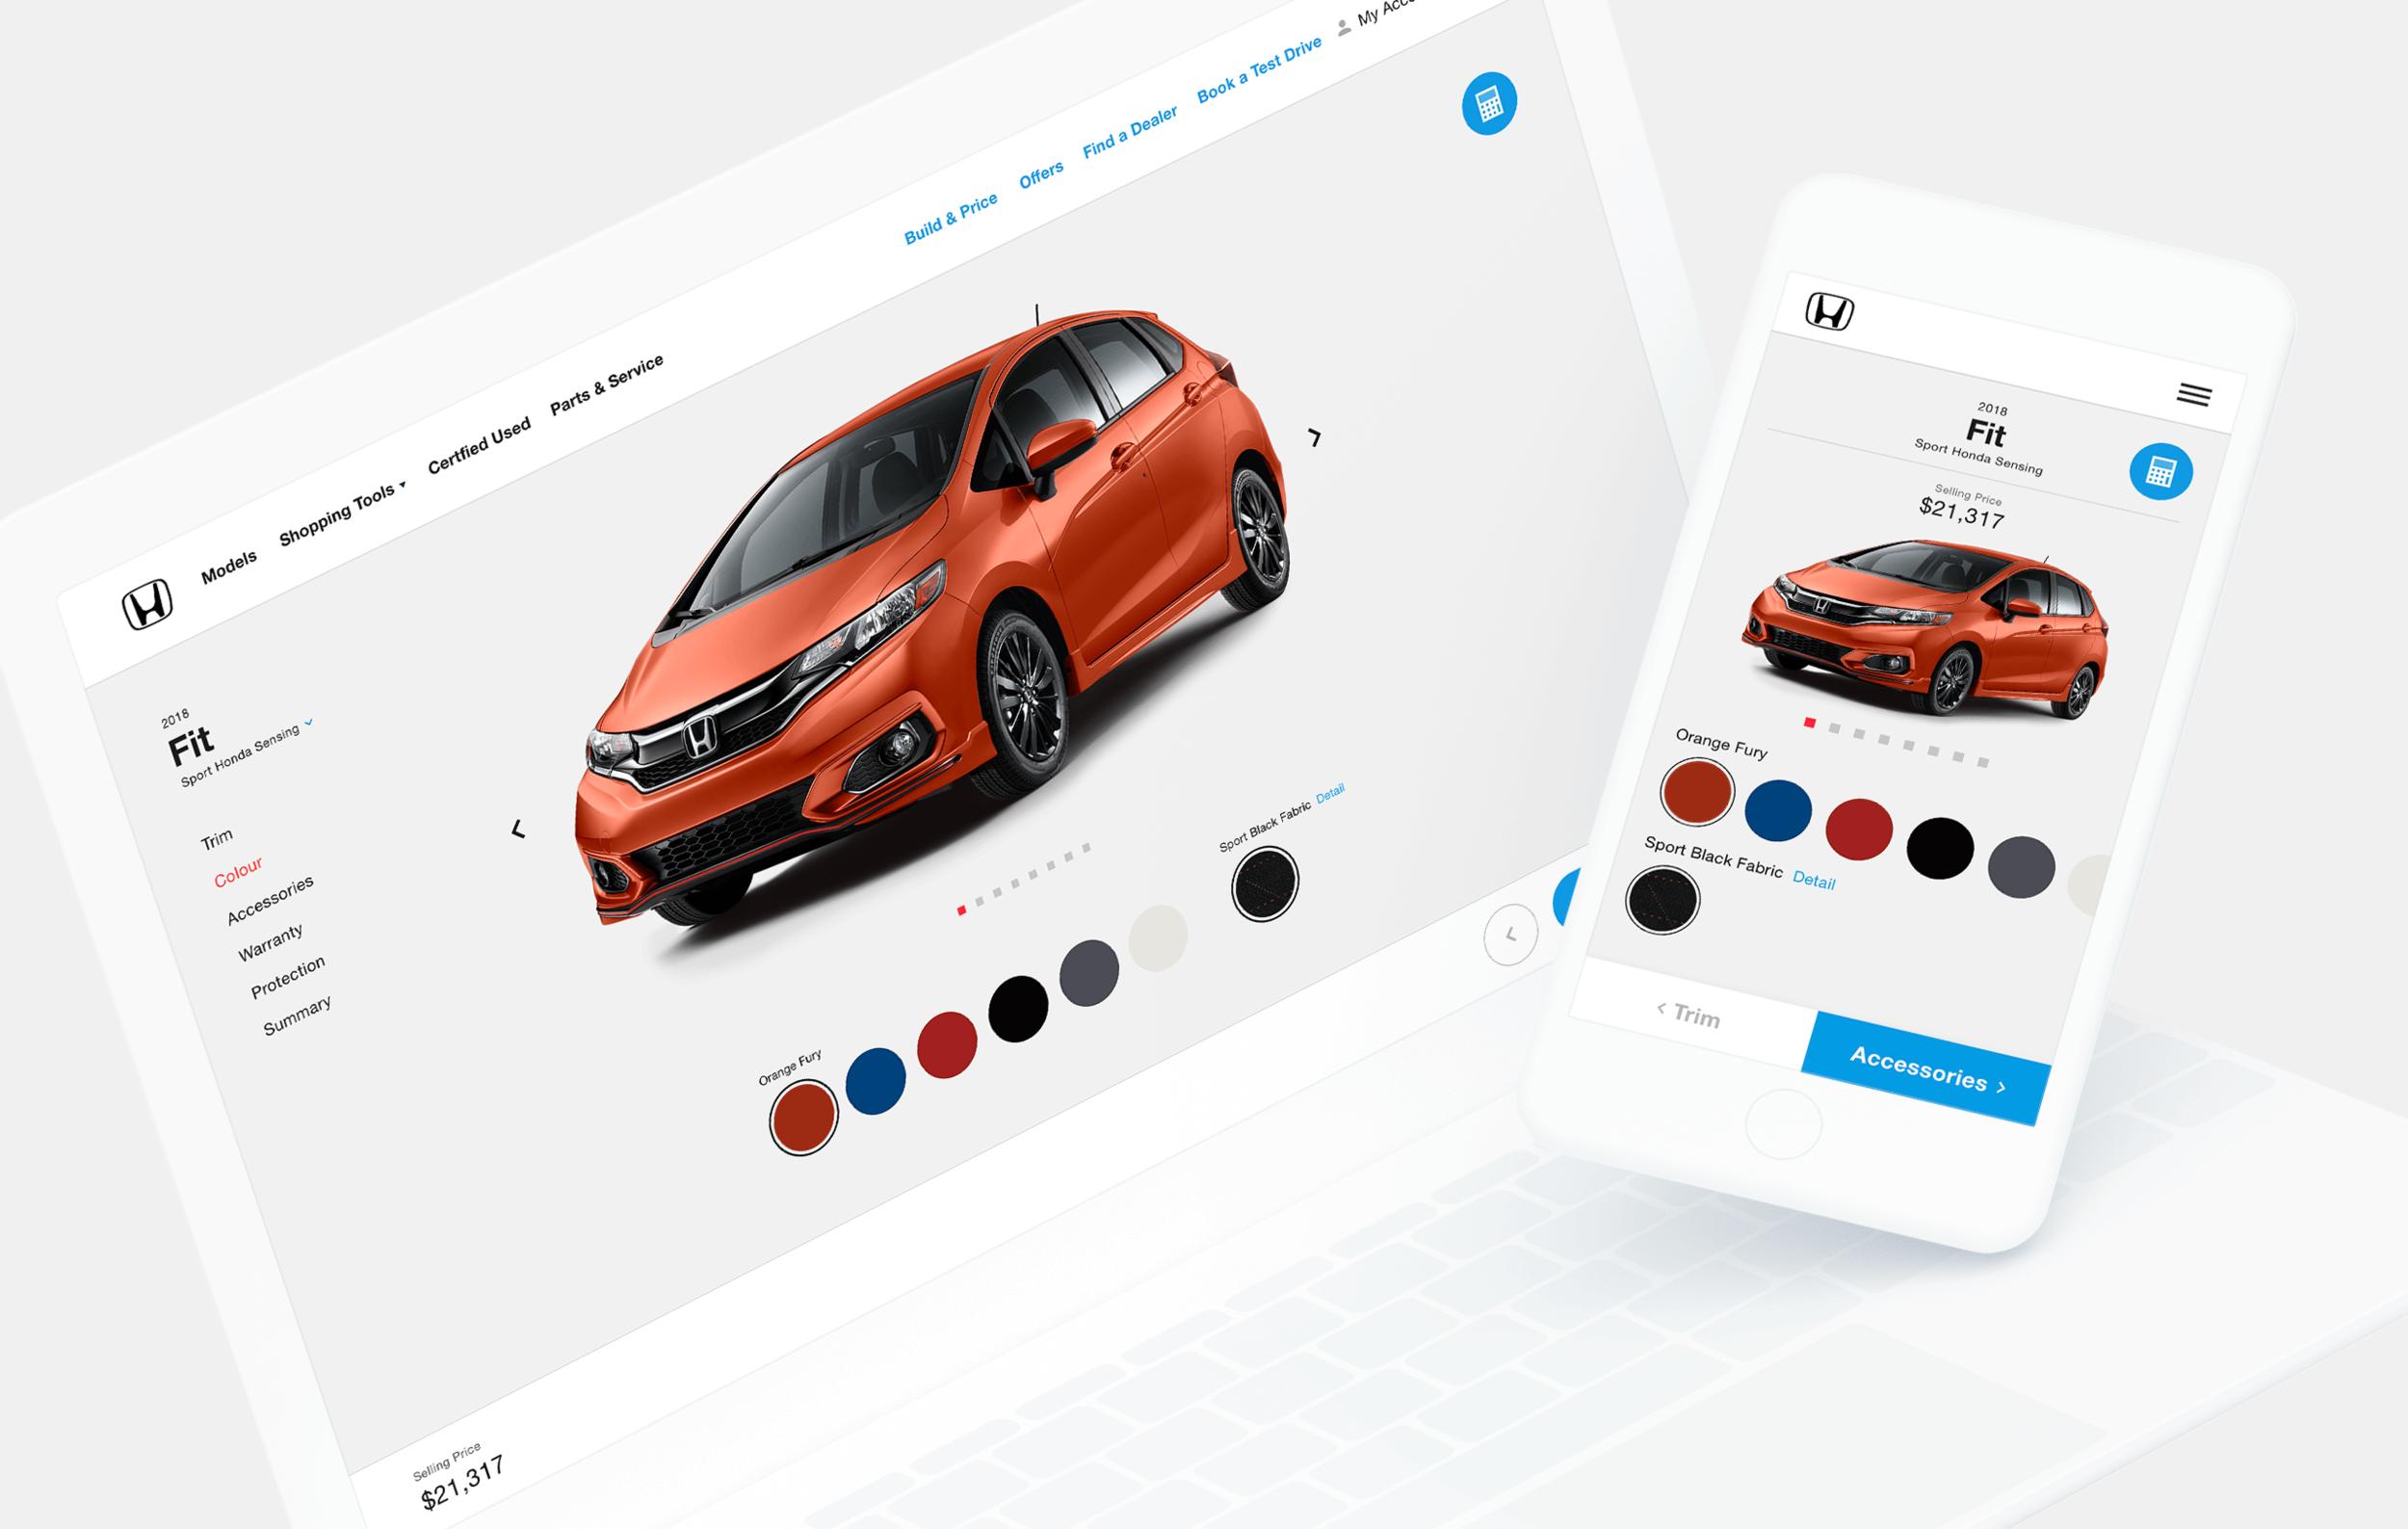 Honda Build And Price >> Honda Build And Price Jason Pearl